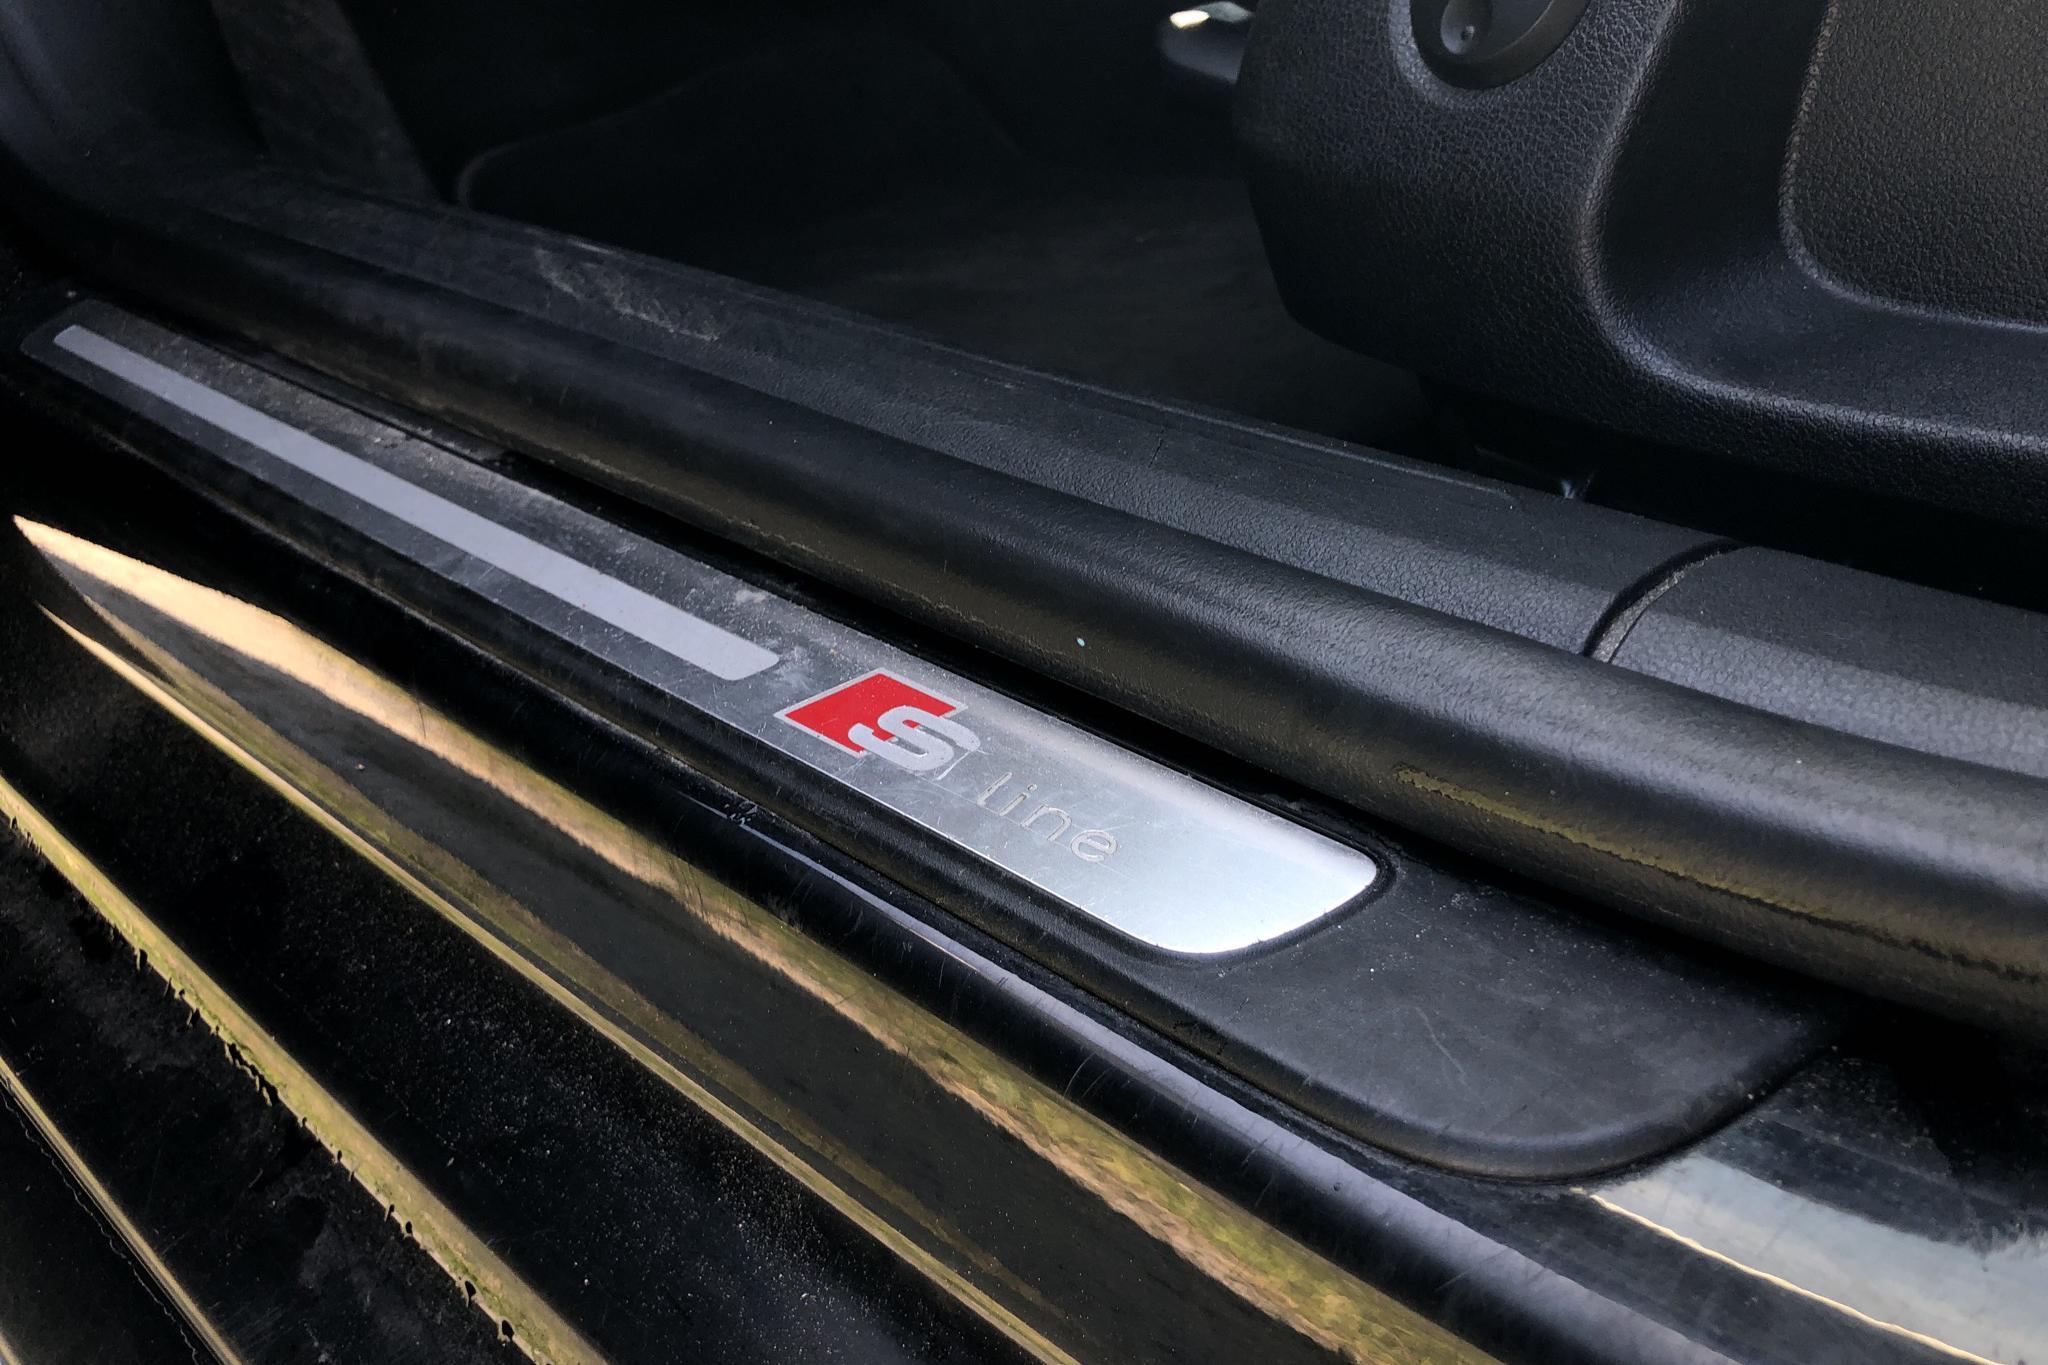 Audi A5 2.0 TFSI Sportback quattro (211hk) - 140 290 km - Automatic - black - 2011